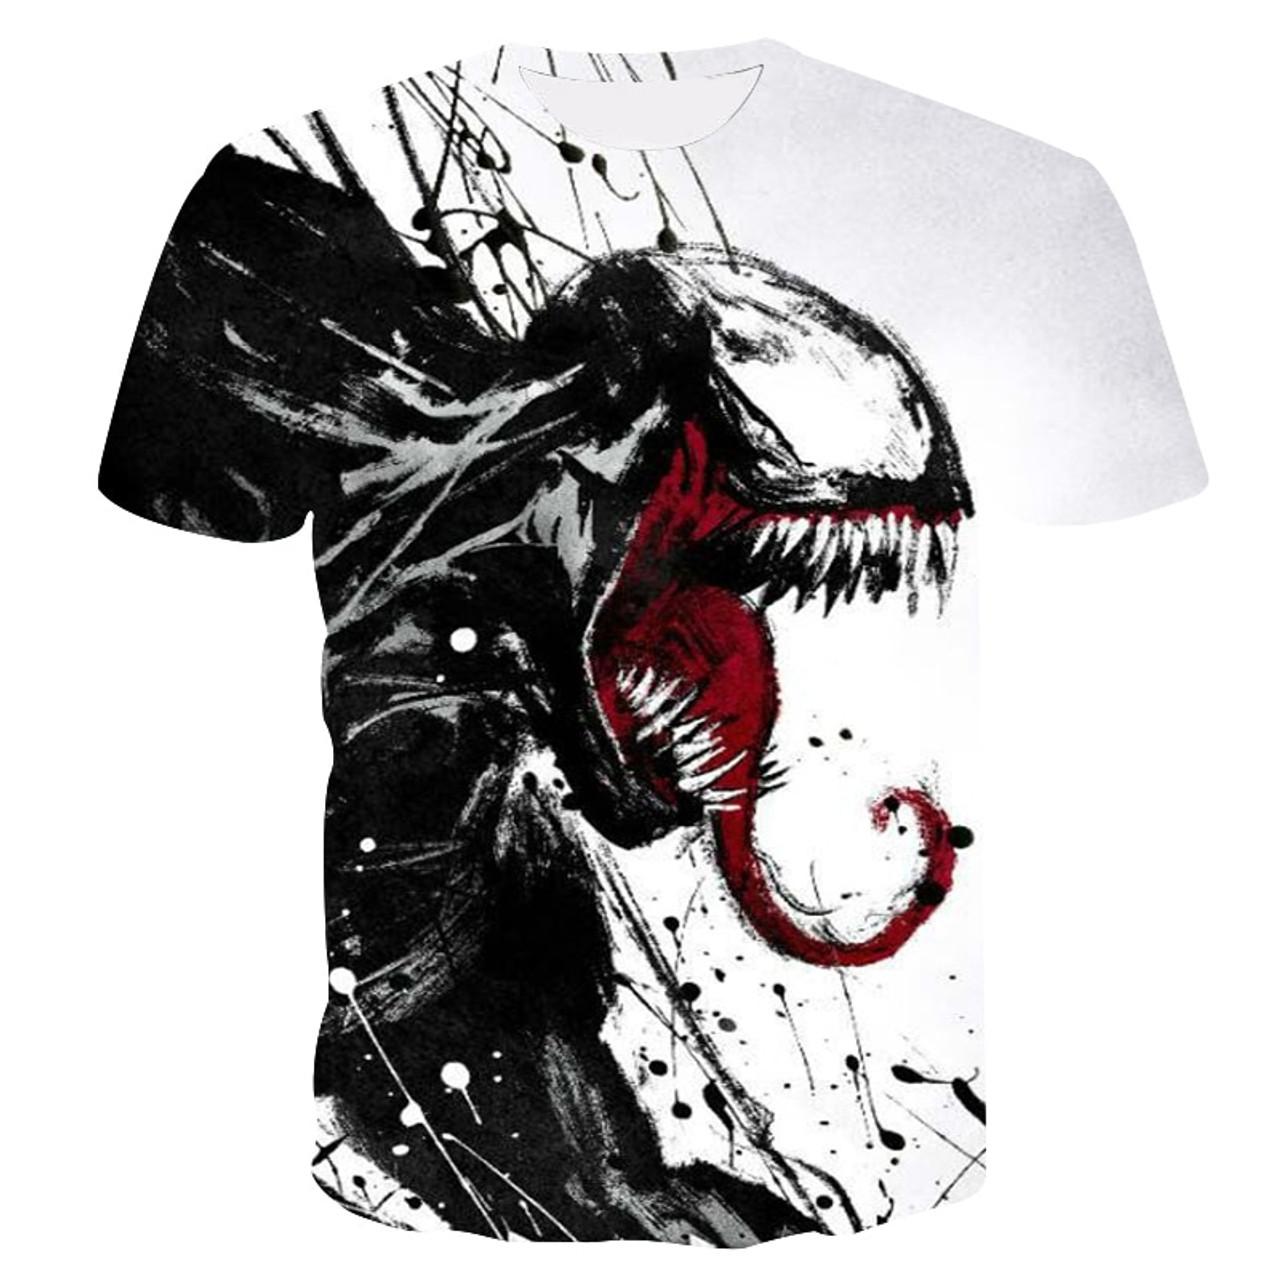 889bdfa148 2019 new venom men's t-shirt 3D printing Marvel series casual shirt summer  cool T ...